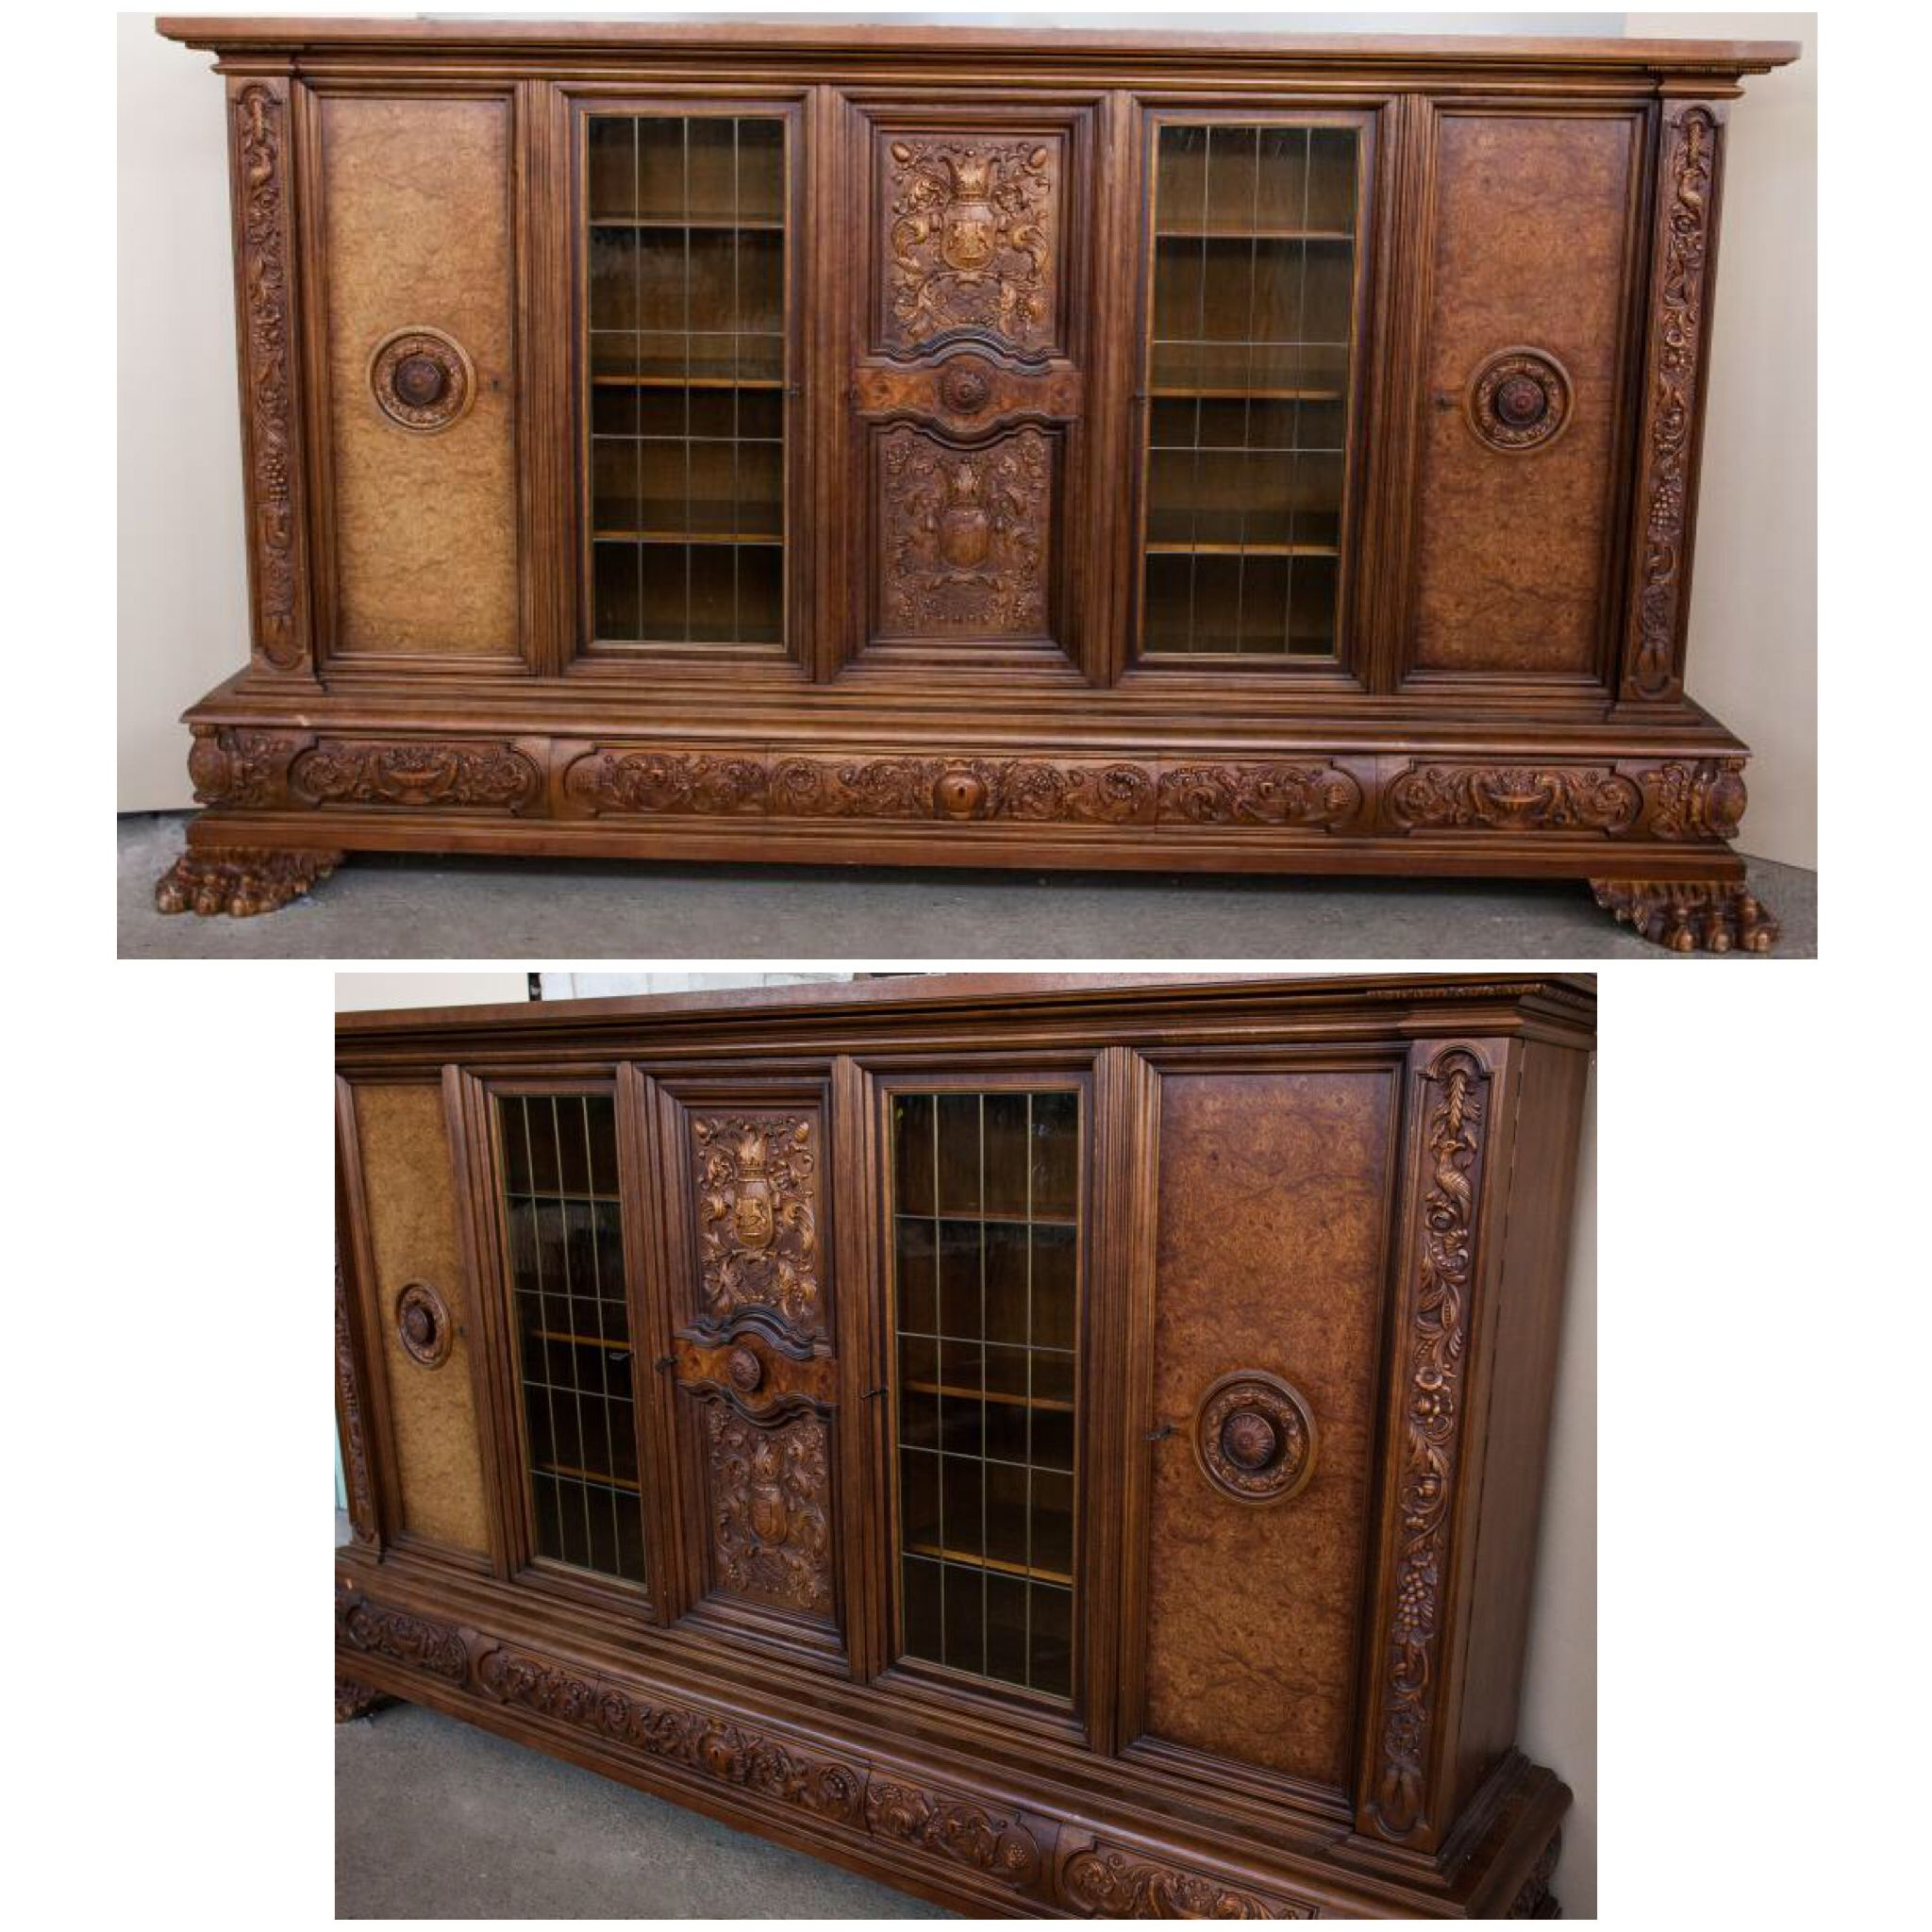 Старинный книжный шкаф из Европы 312х60х168 см 190 000р